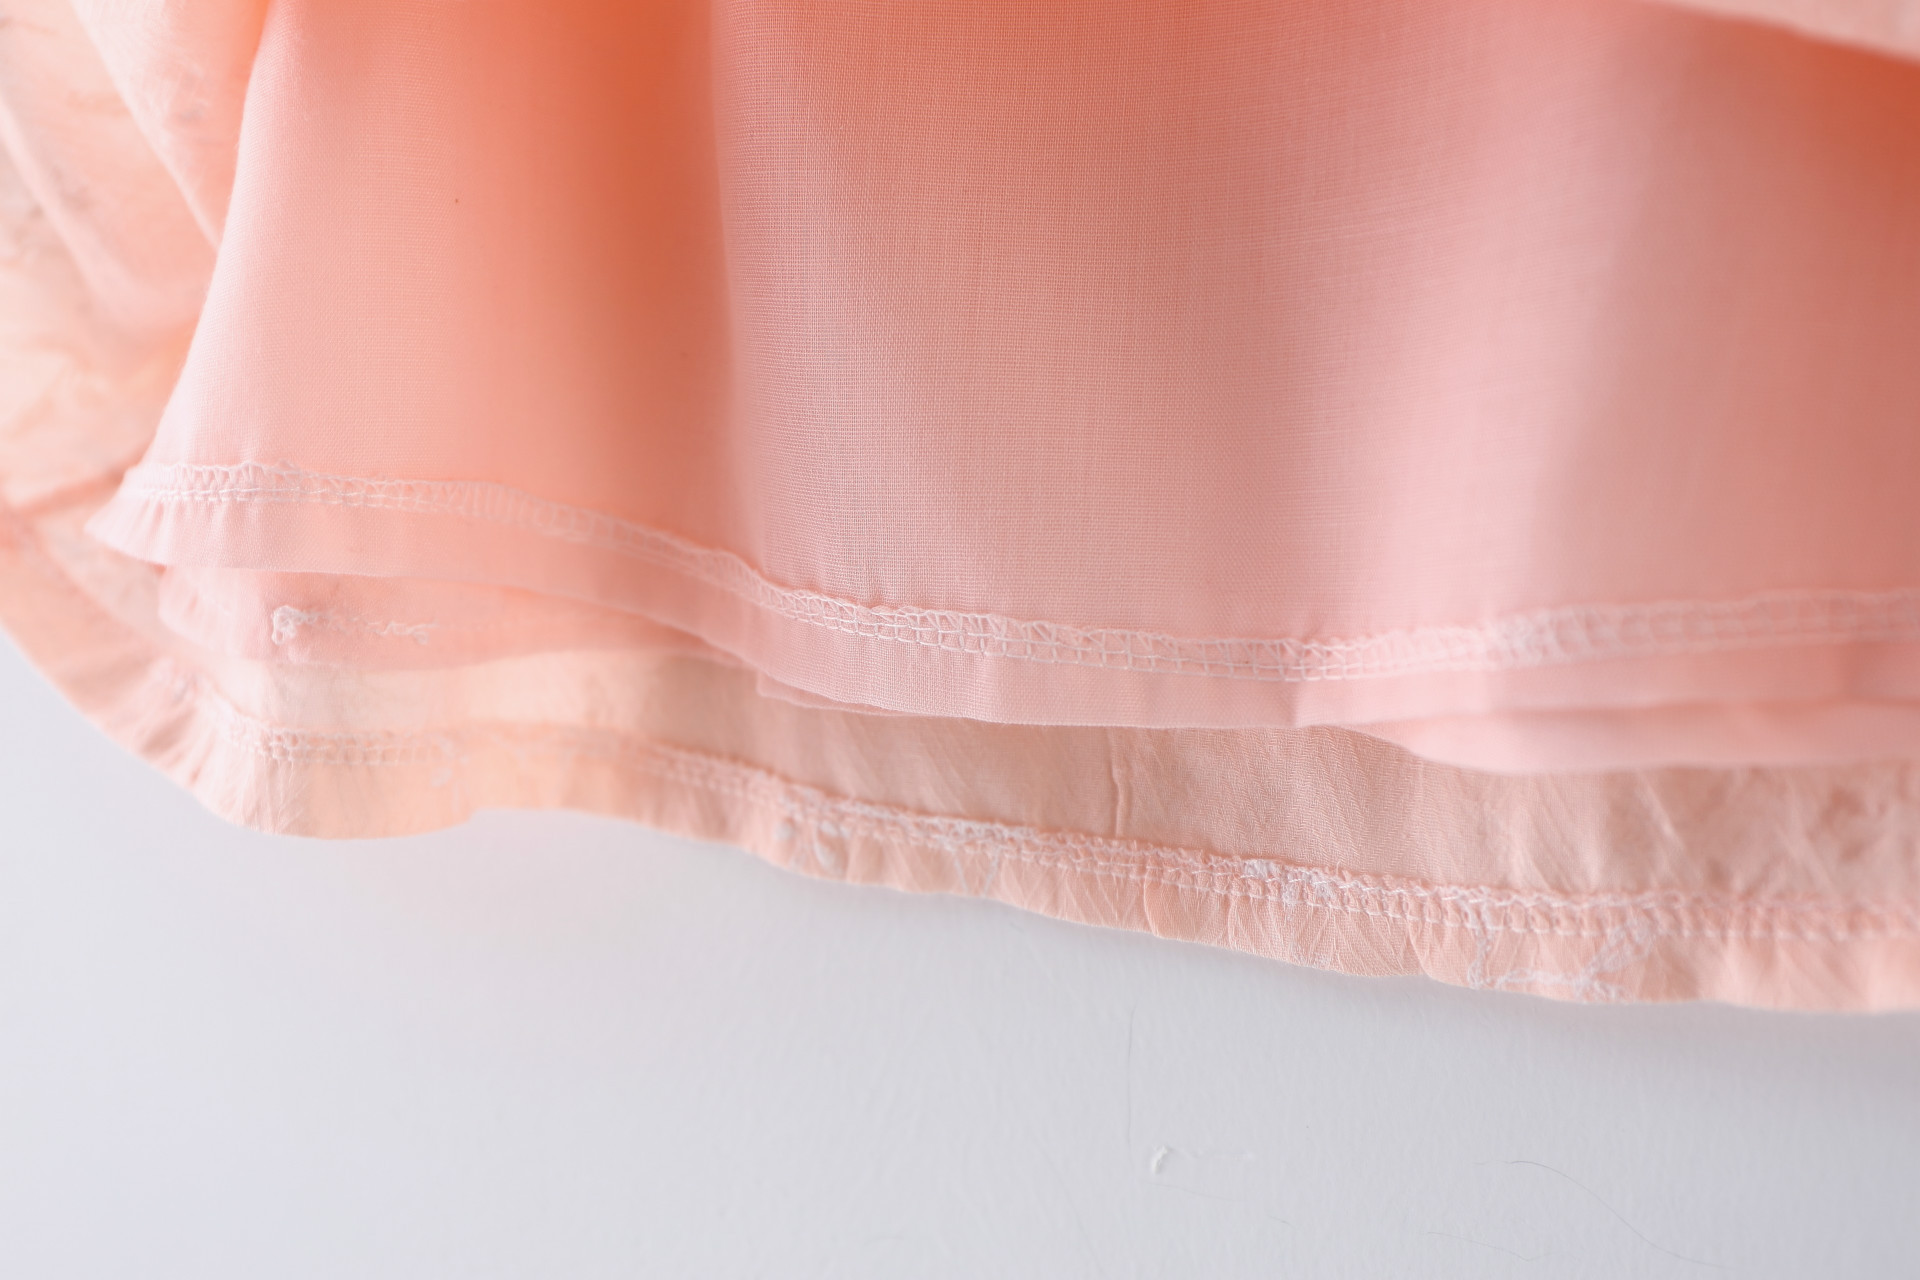 HTB1RZHJkwaTBuNjSszfq6xgfpXa9 - 2018 New Brand Princess Dress Sleeveless Cotton Kids Dresses For Girls Bow Children Toddler Girl Dresses